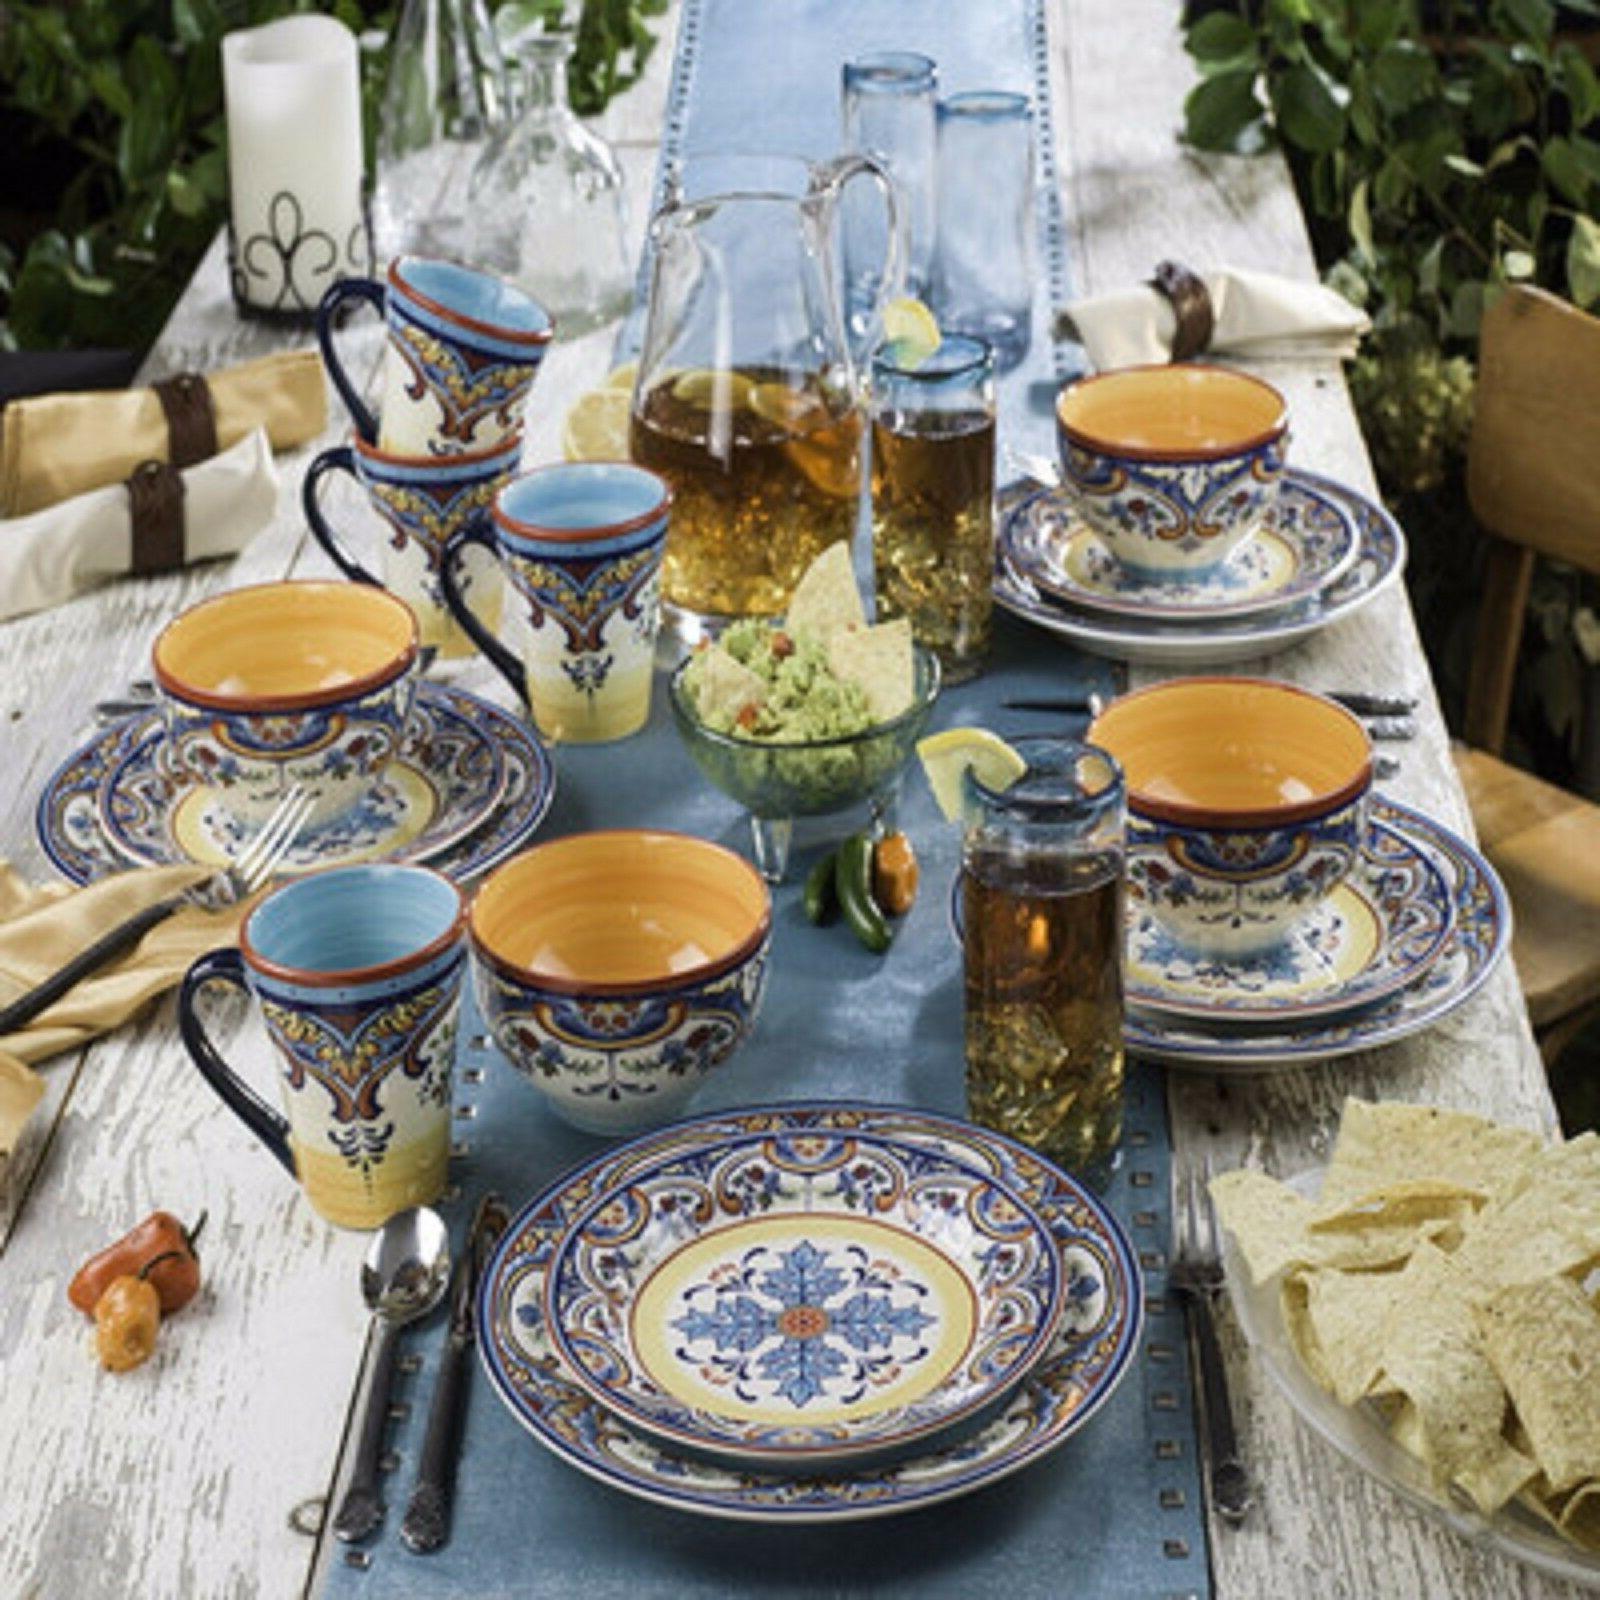 Dinnerware Zanzibar 16 Piece Dishes Cups